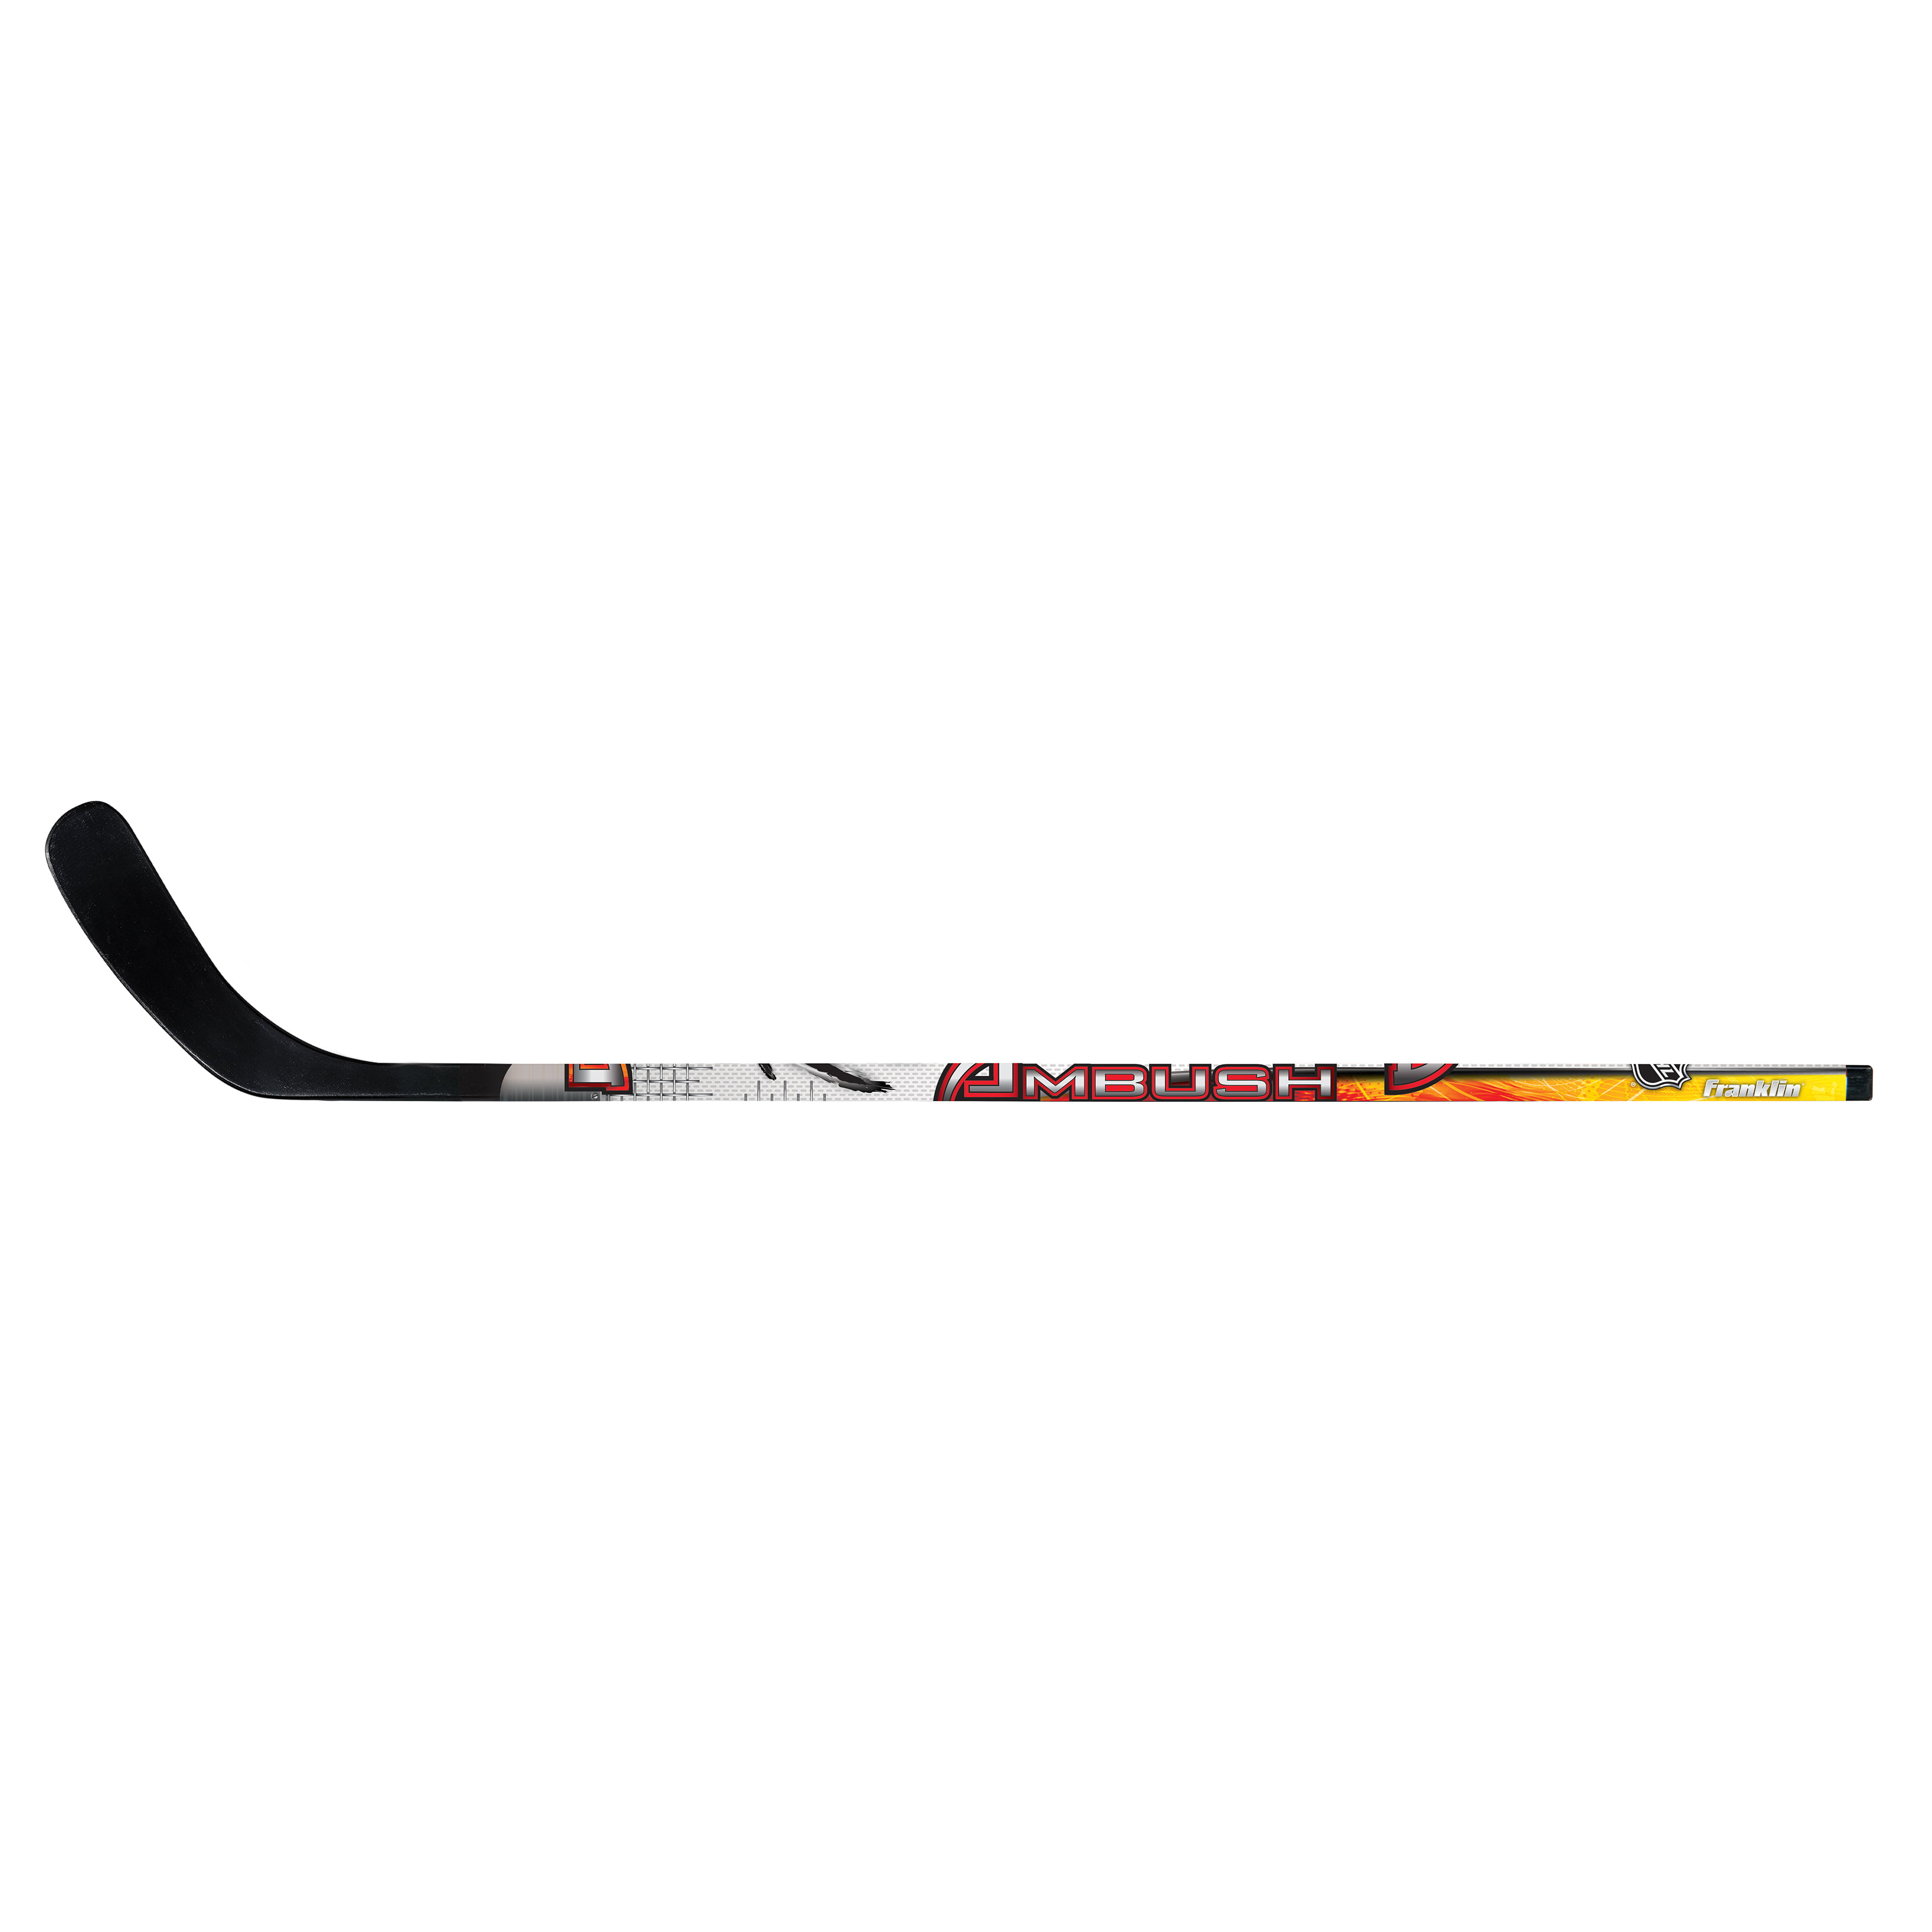 "Franklin Sports Youth Left Shot Ambush Street Hockey Stick 46"" by Franklin Sports"